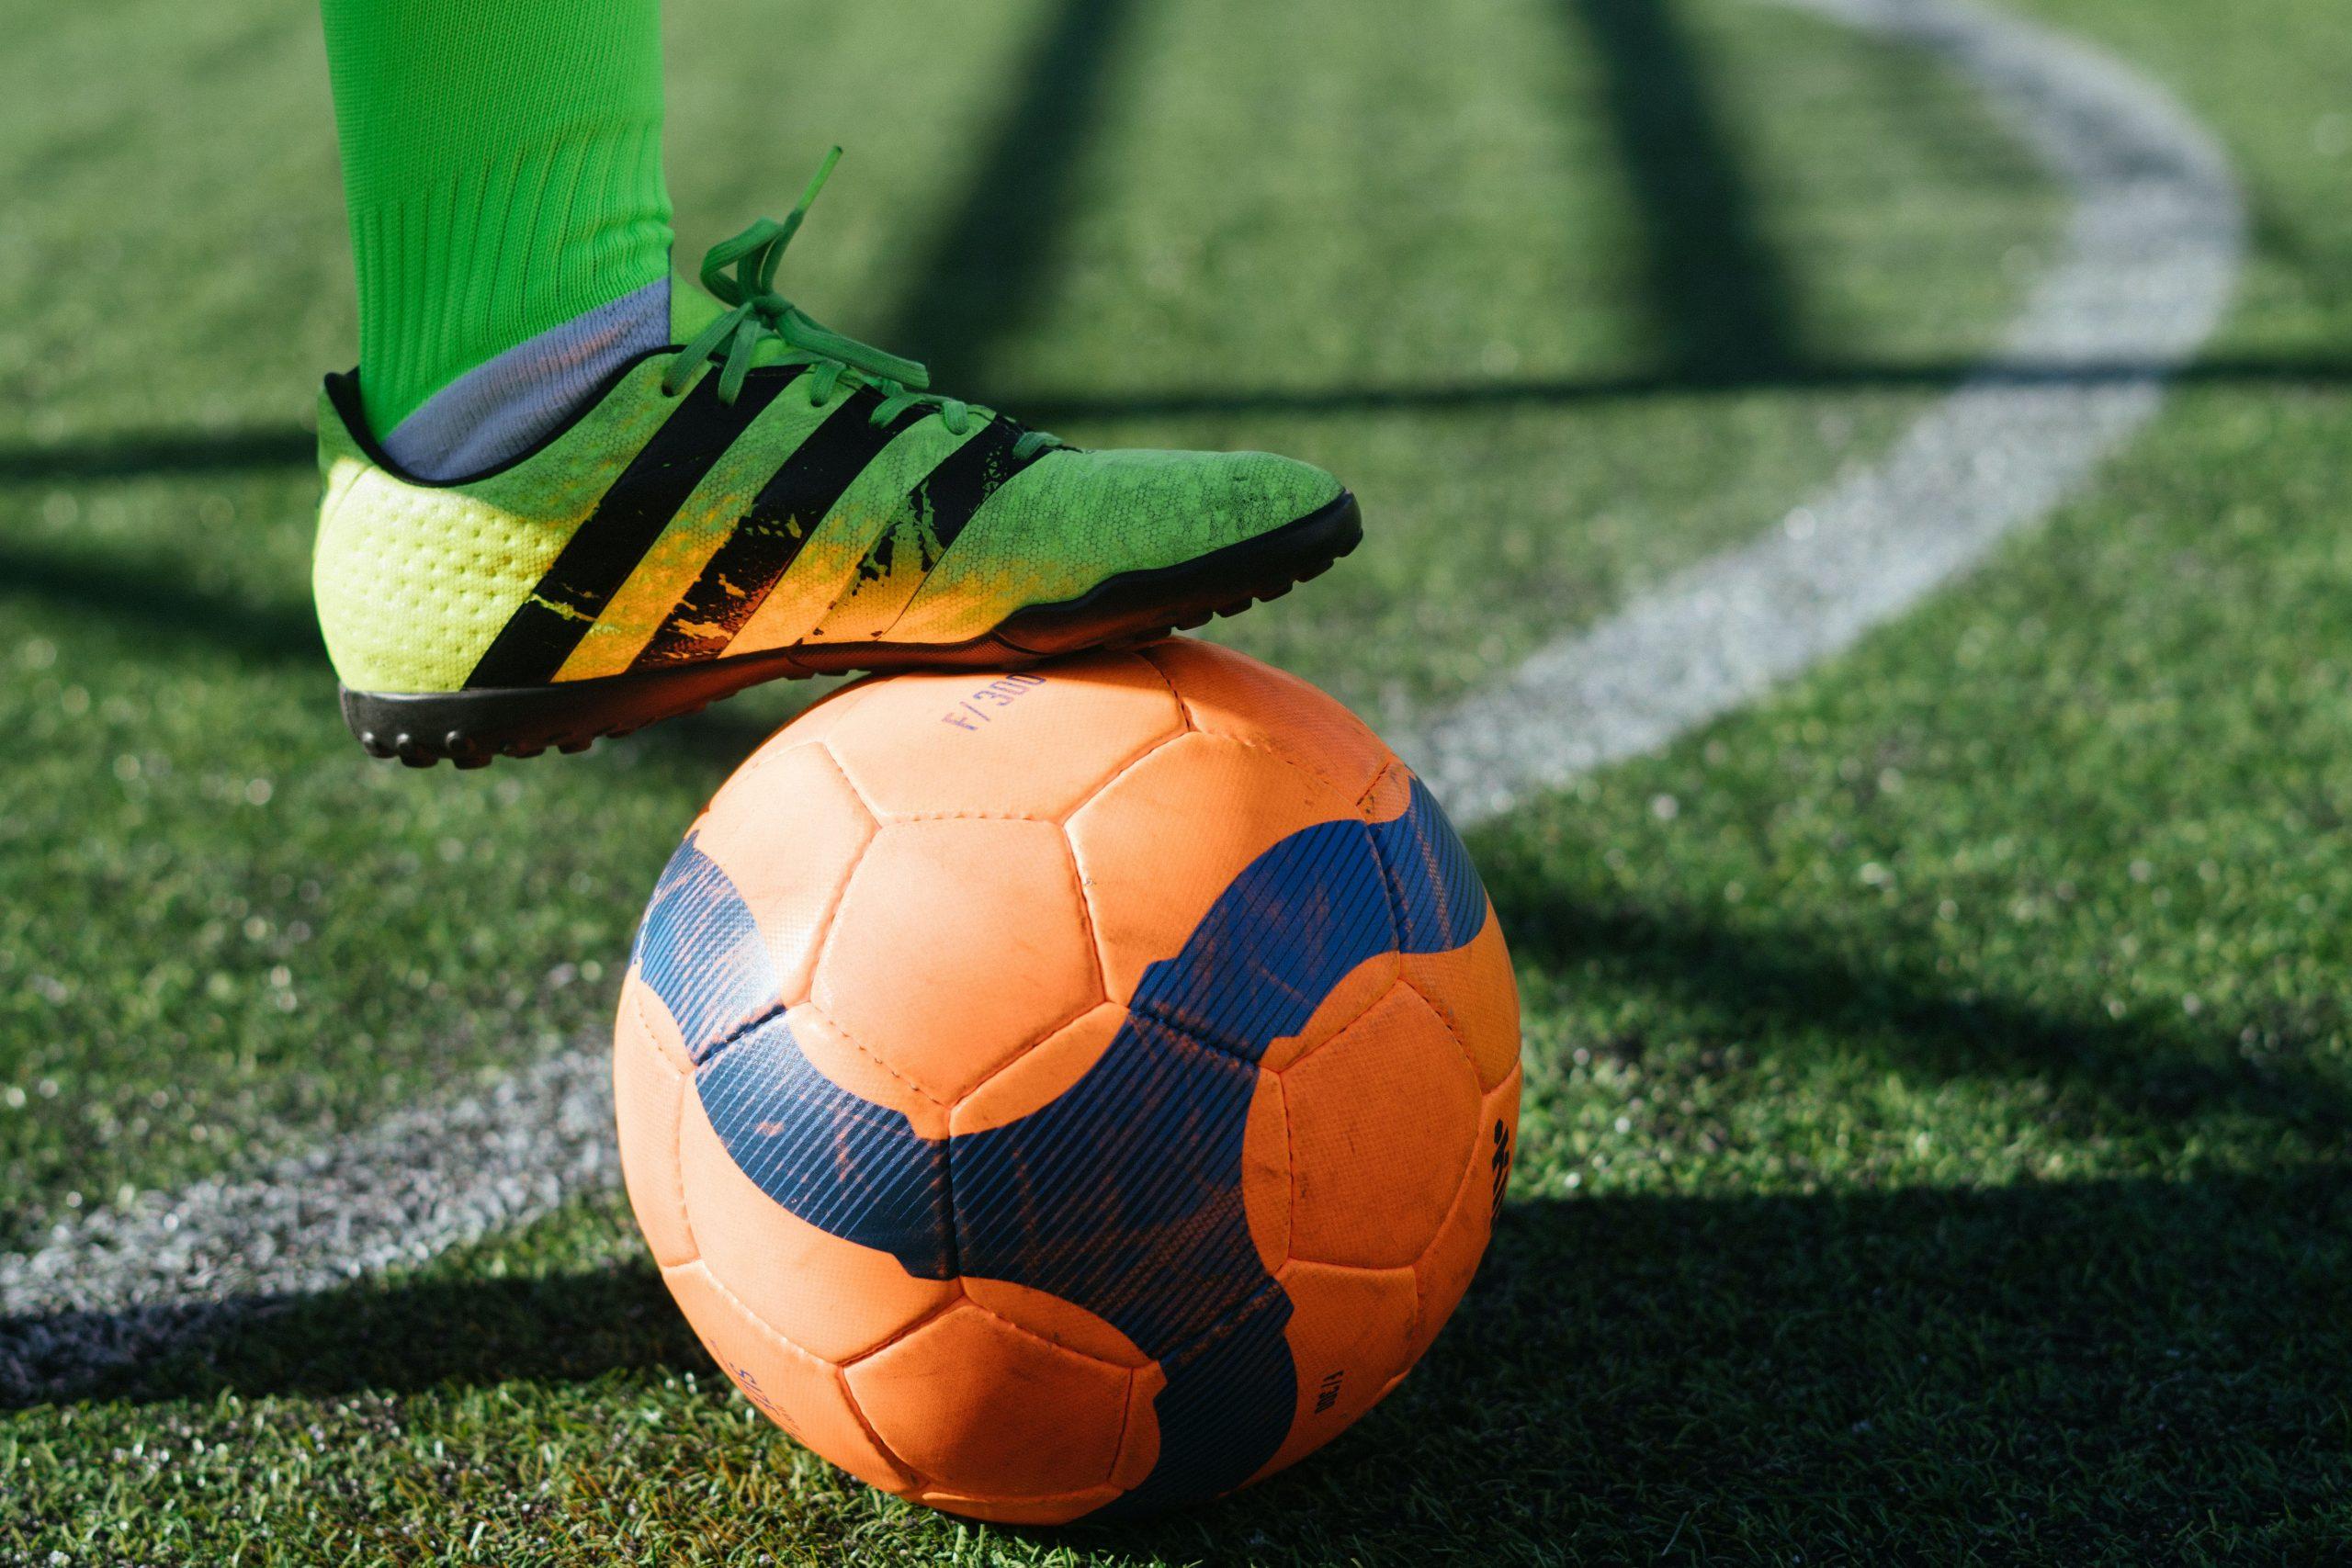 A yellow boot standing on an orange soccer ball